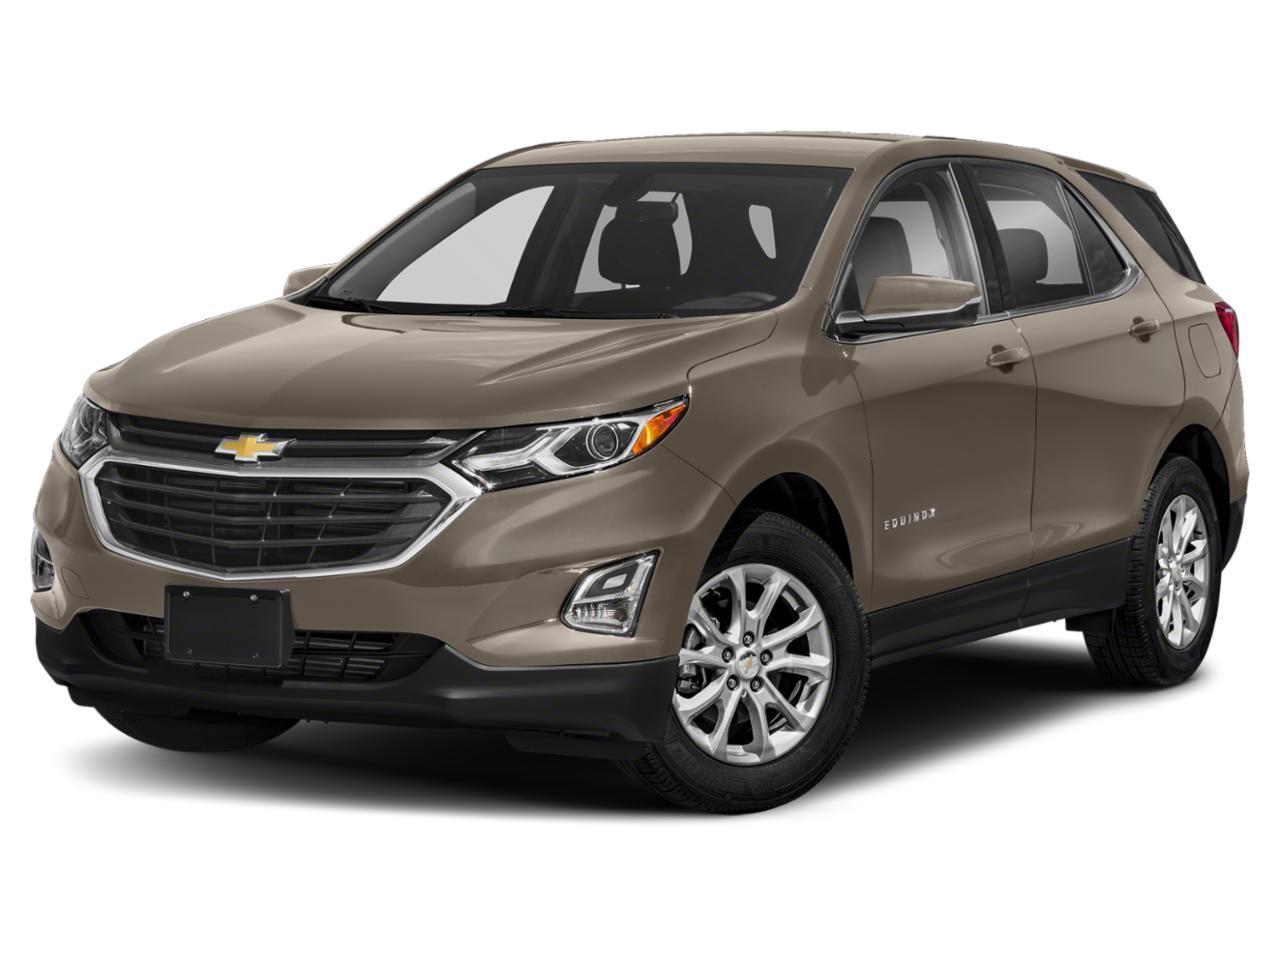 2018 Chevrolet Equinox Vehicle Photo in Colma, CA 94014